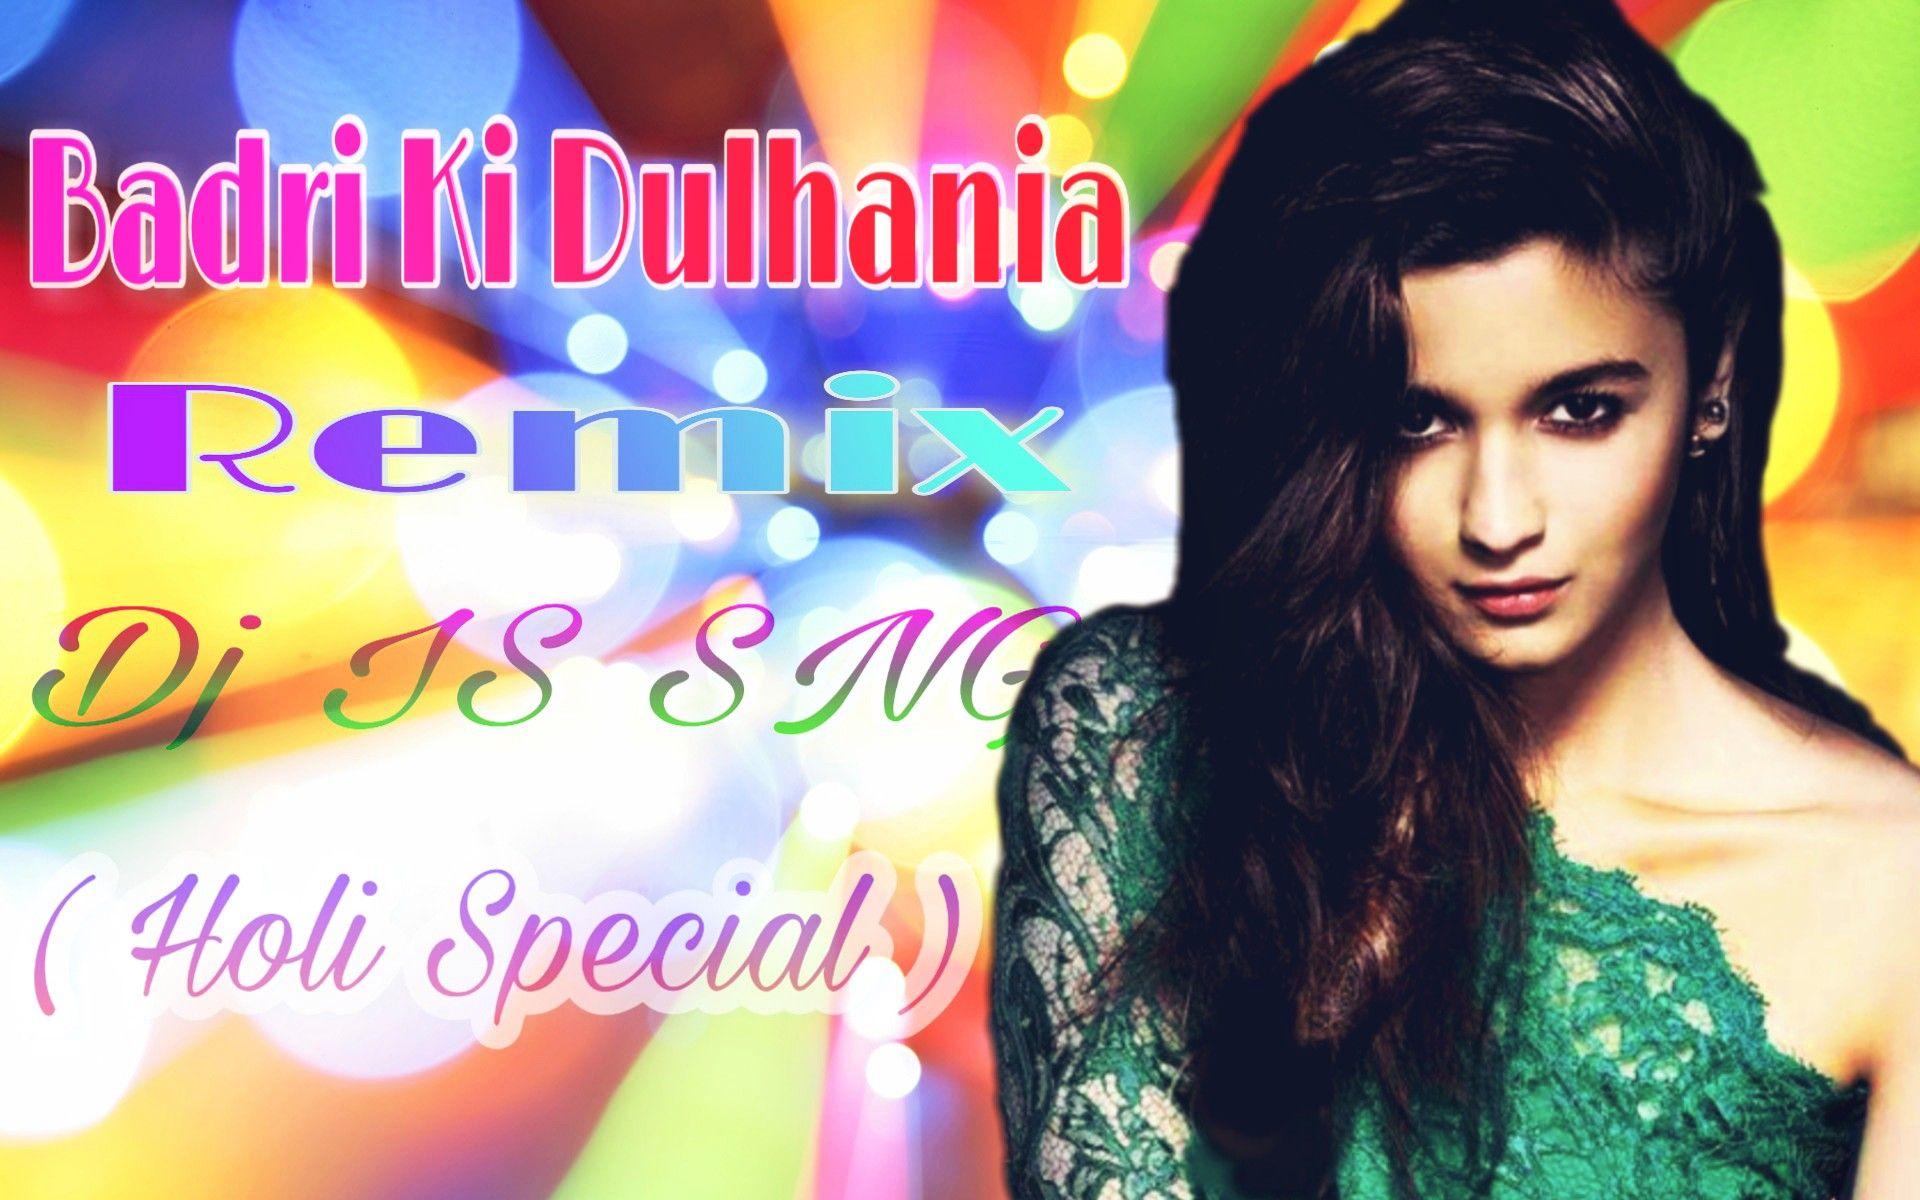 Badri Ki Dulahniya Remix Dj Is Sng Holi Spacial Song Badri Ki Dulahniya Remix Movie Badri Ki Dulahniya Singer Remix Music Holi Special Dj Remix Music